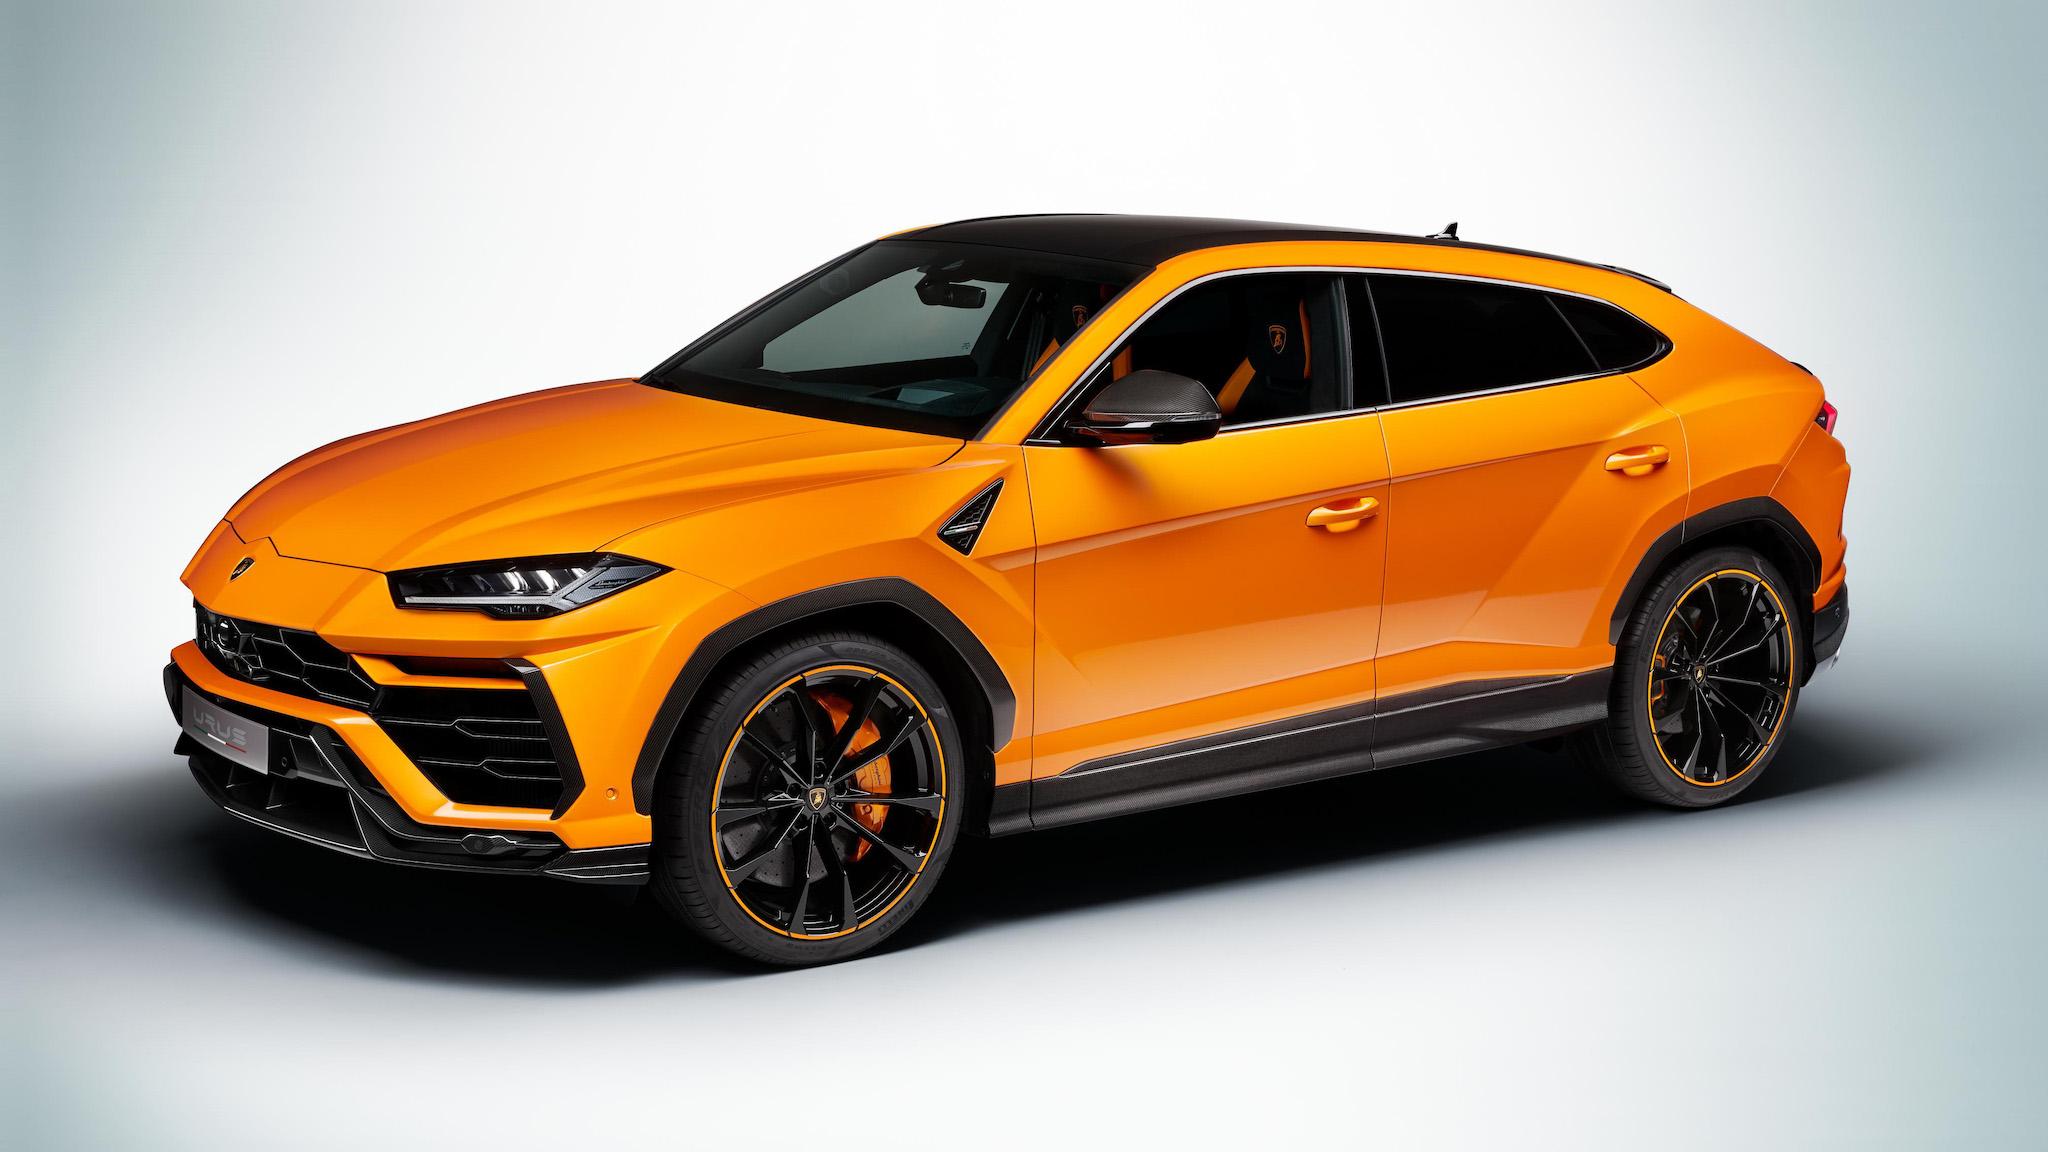 Lamborghini Urus 臻選訂製系列登台,台灣下半年開放選配